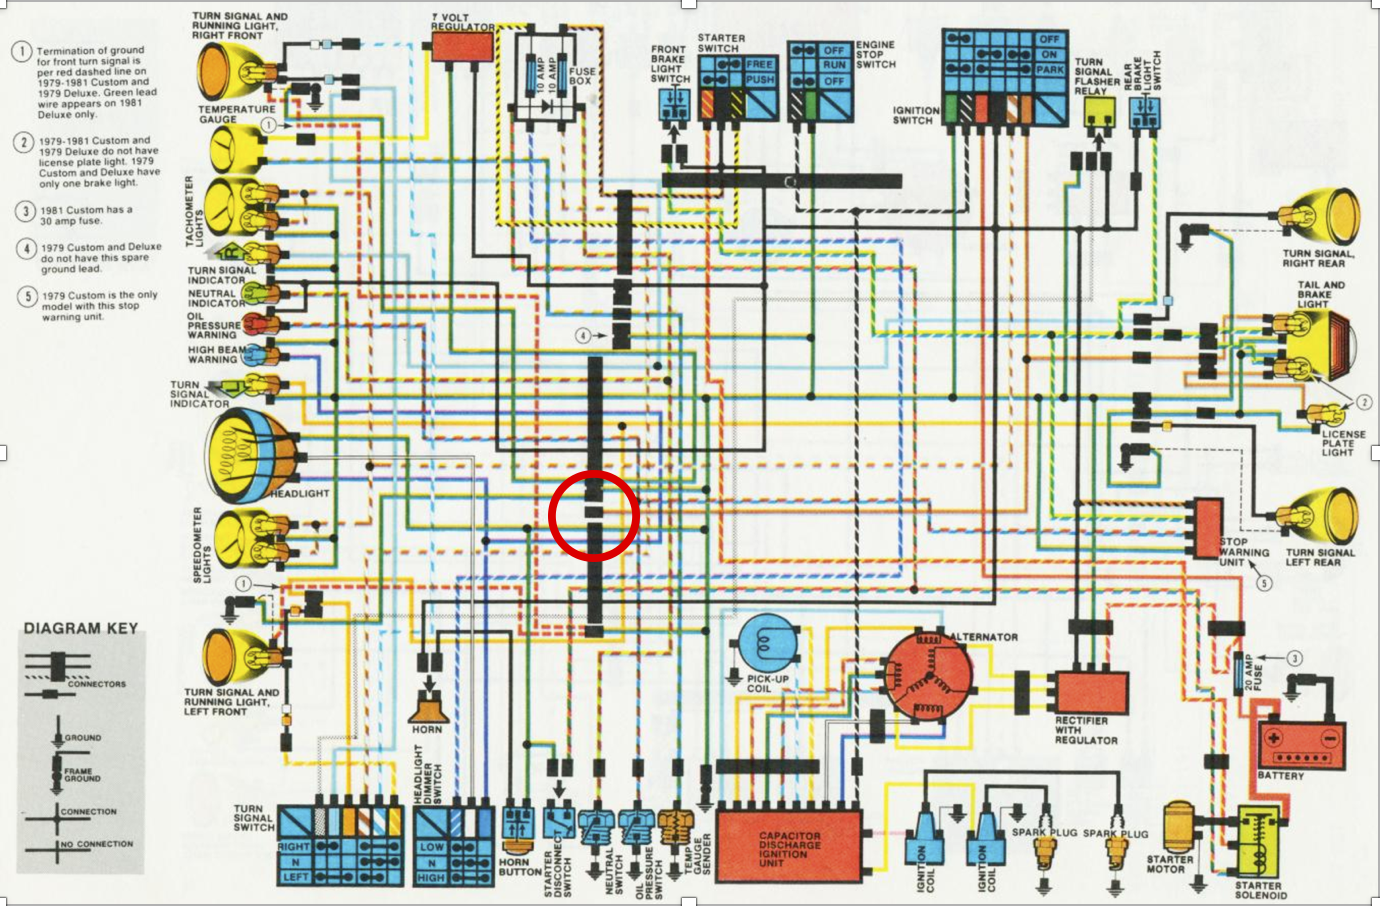 CX500 wiring diagram help | Honda CX 500 ForumCX500 forum